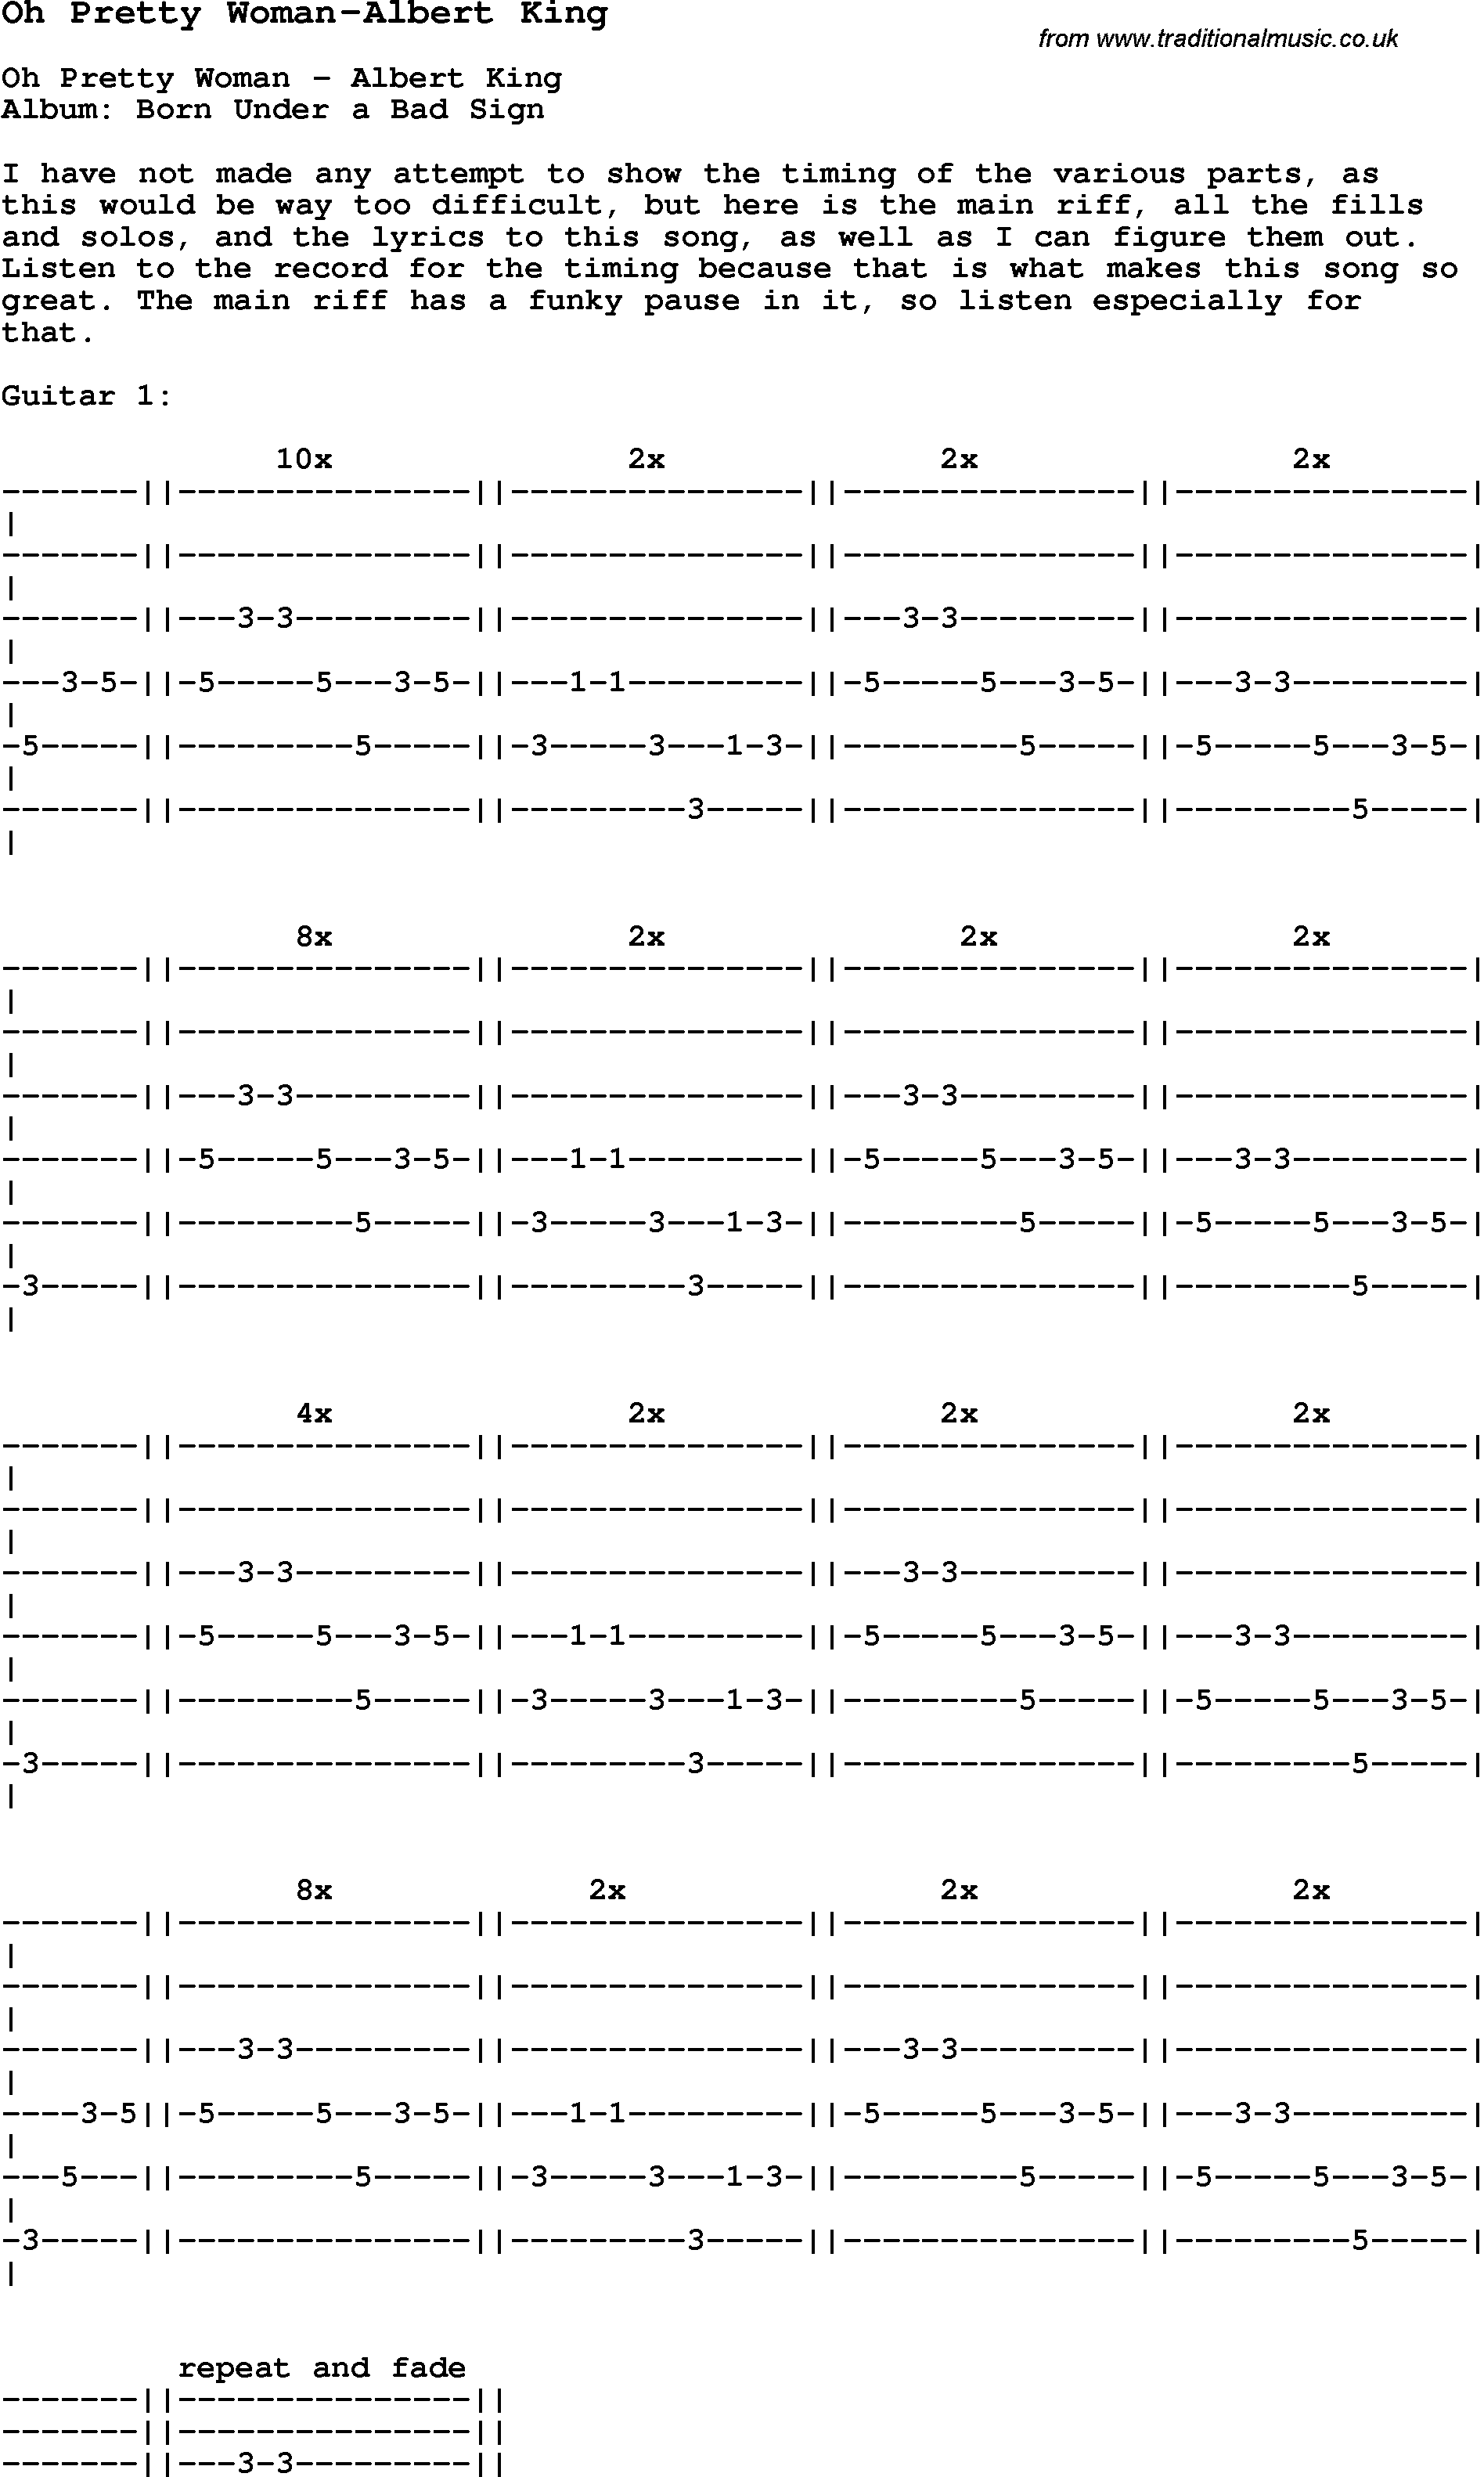 Blues guitar song lyrics chords tablature playing hints for oh blues guitar song lyrics chords tablature playing hints for oh pretty woman hexwebz Images